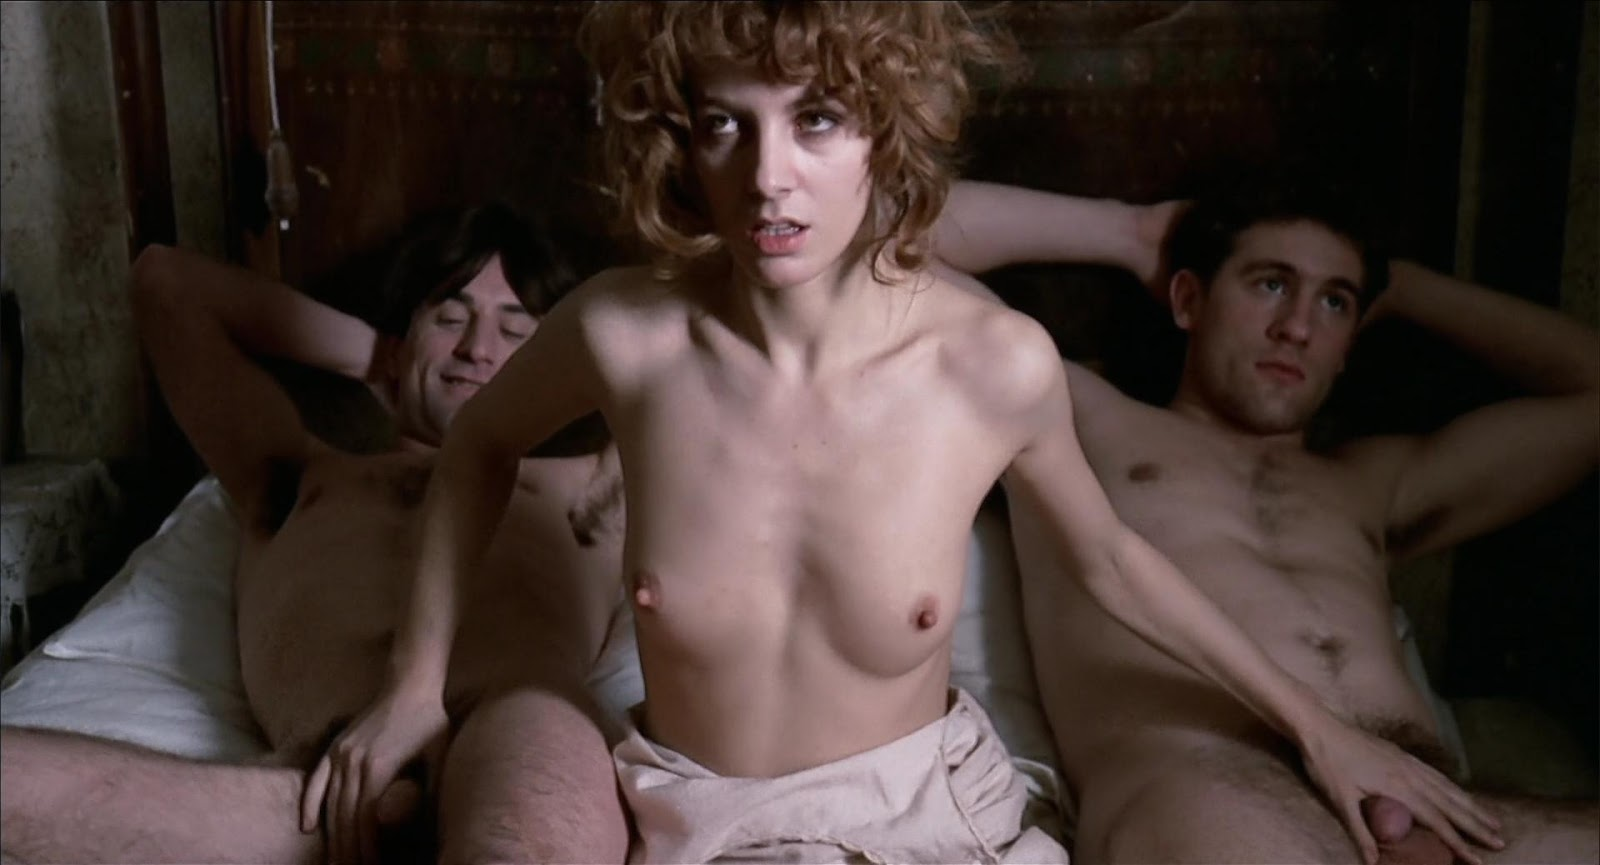 hud-film-so-stsenami-seksa